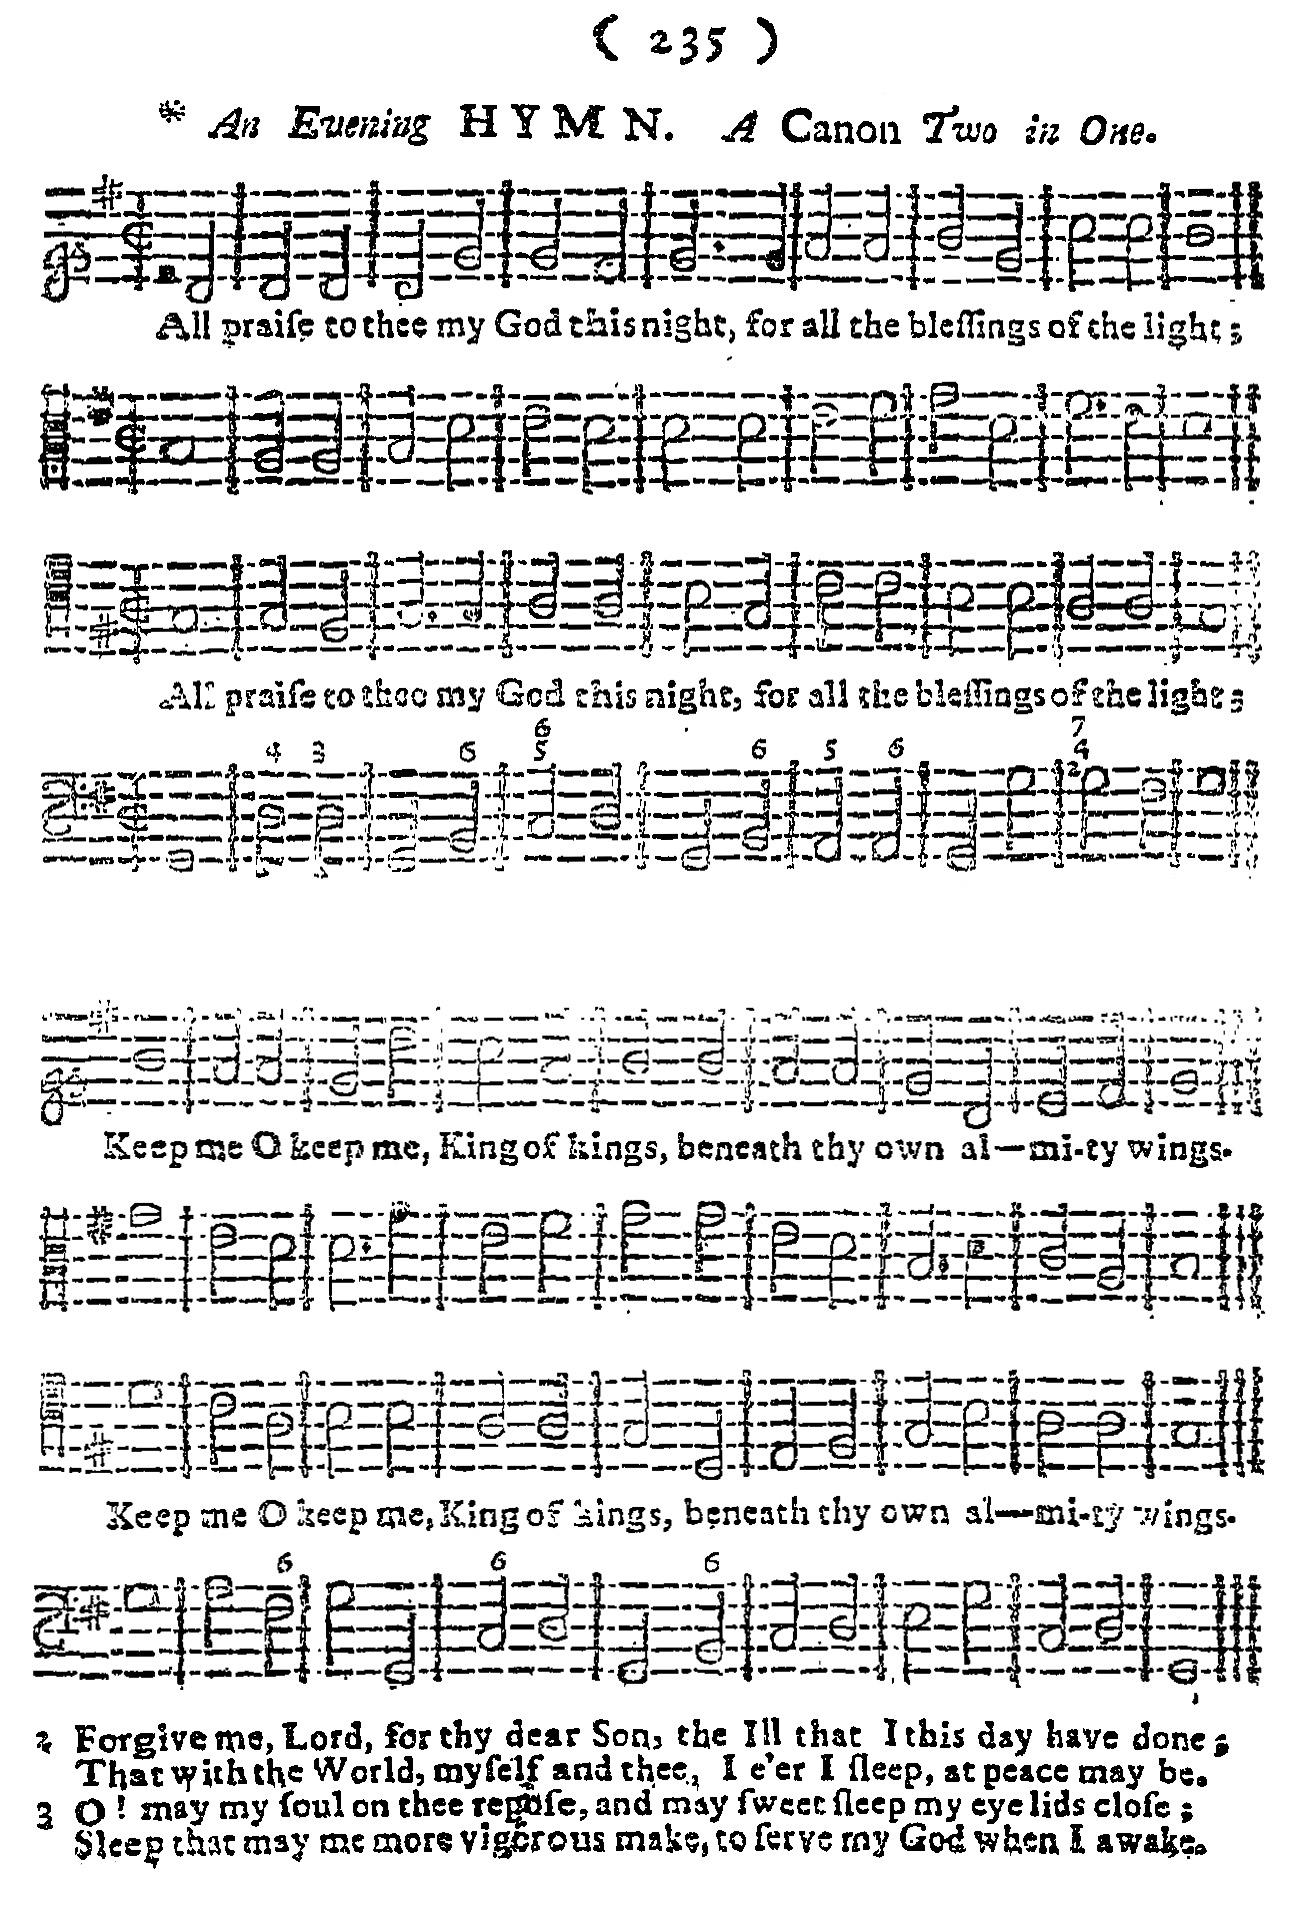 Fig. 10. The Harmonious Companion (London: W. Pearson, 1732). Melody in the tenor.